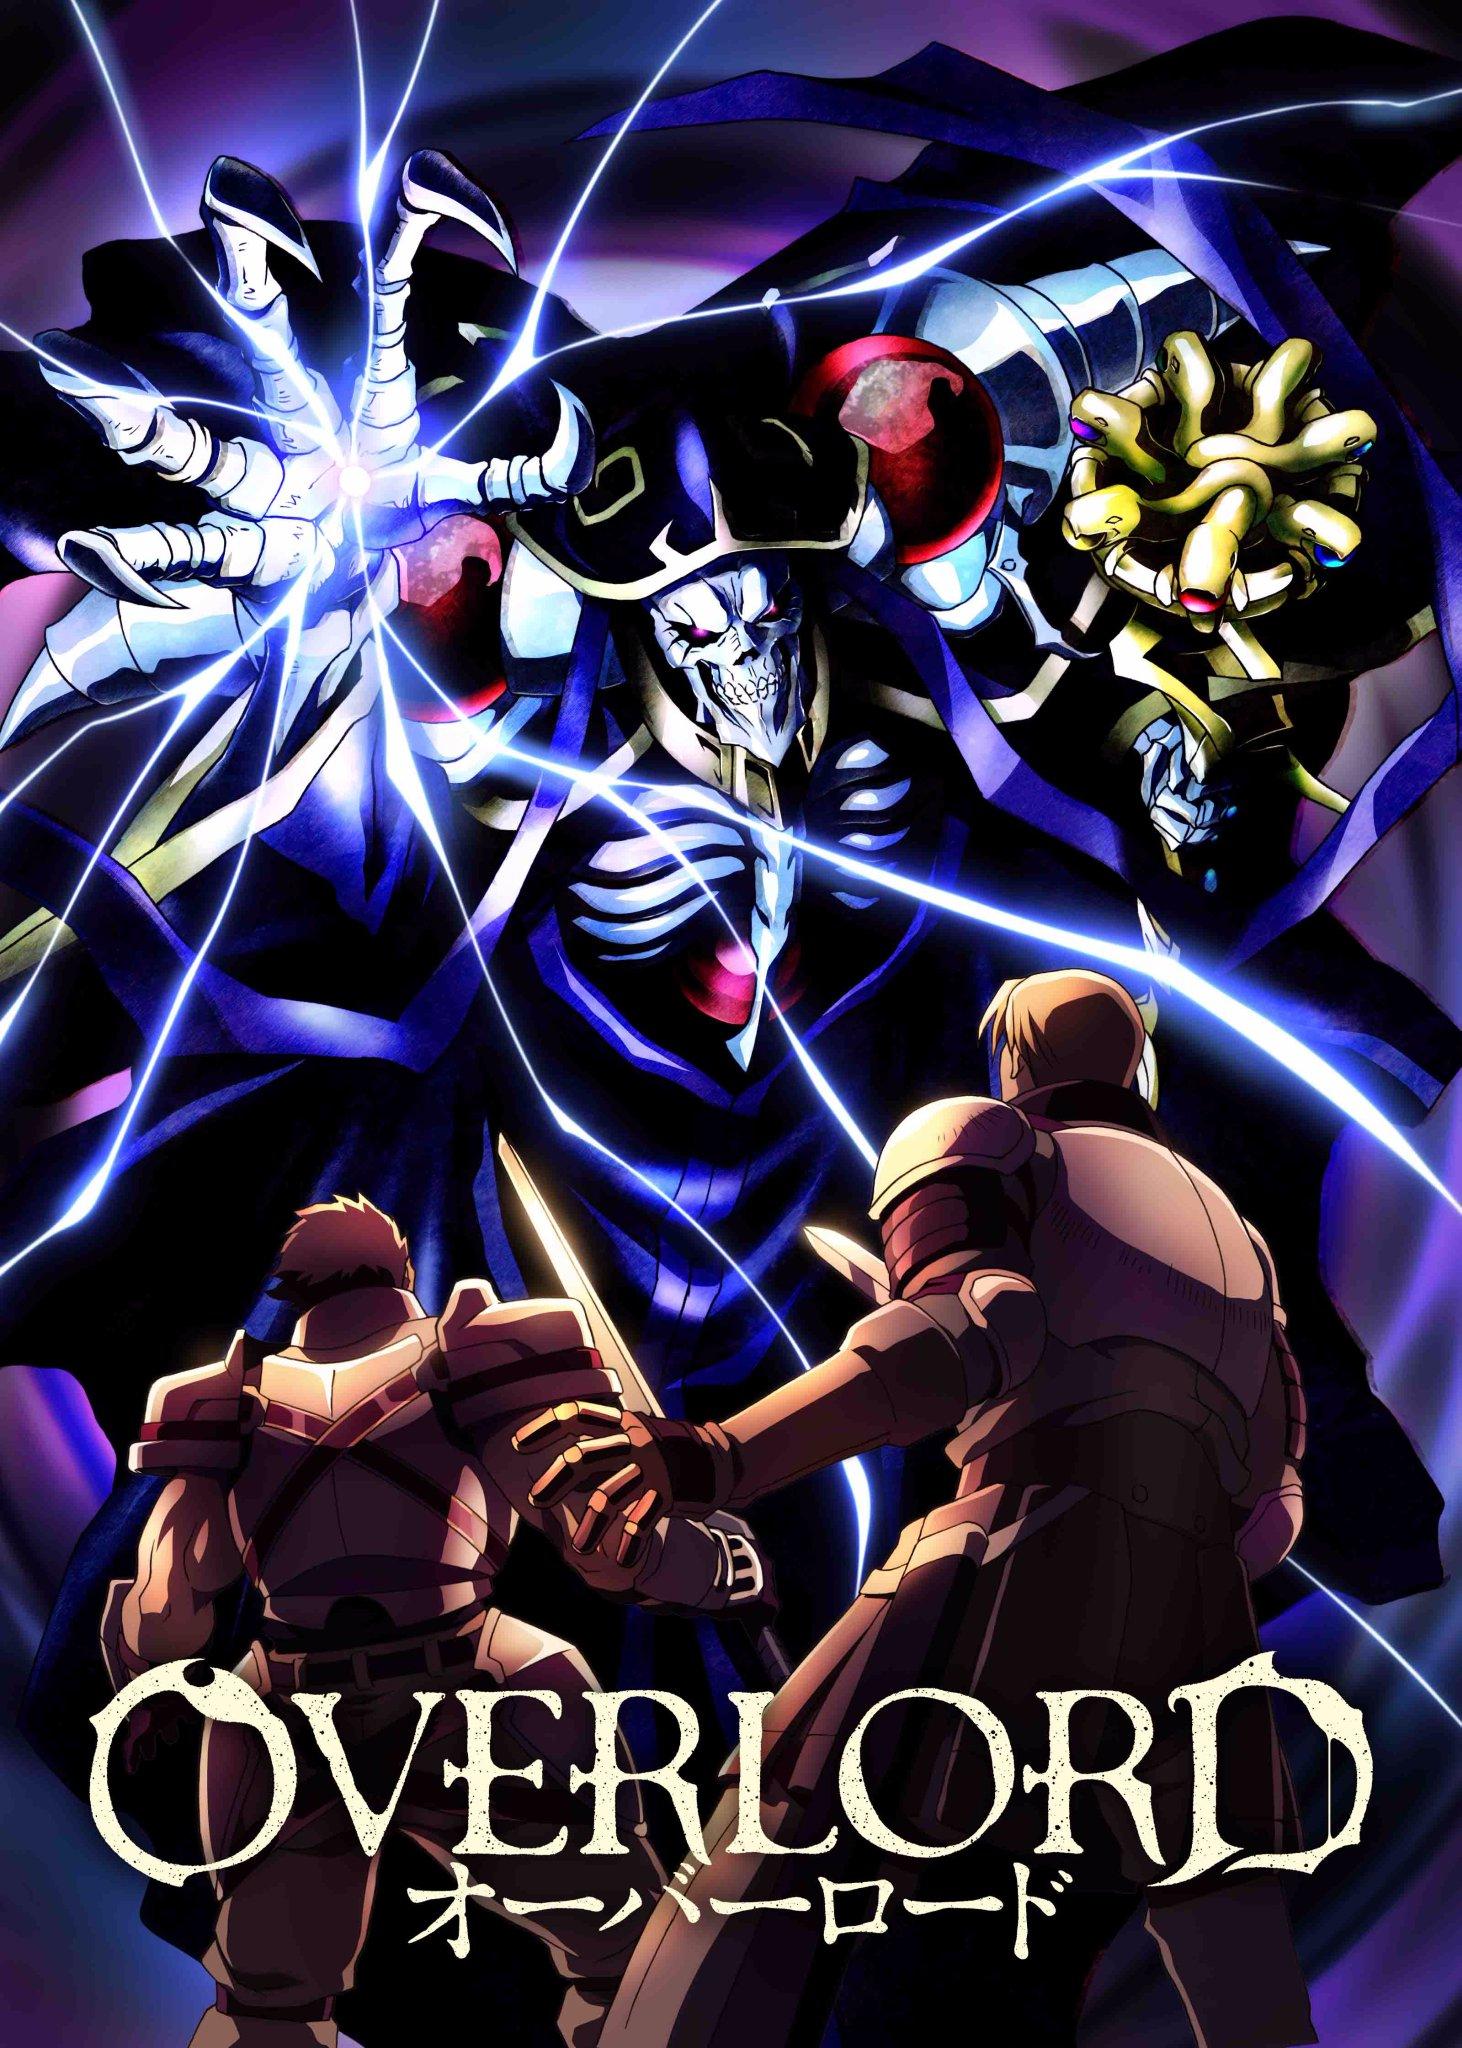 Overlord (Anime)